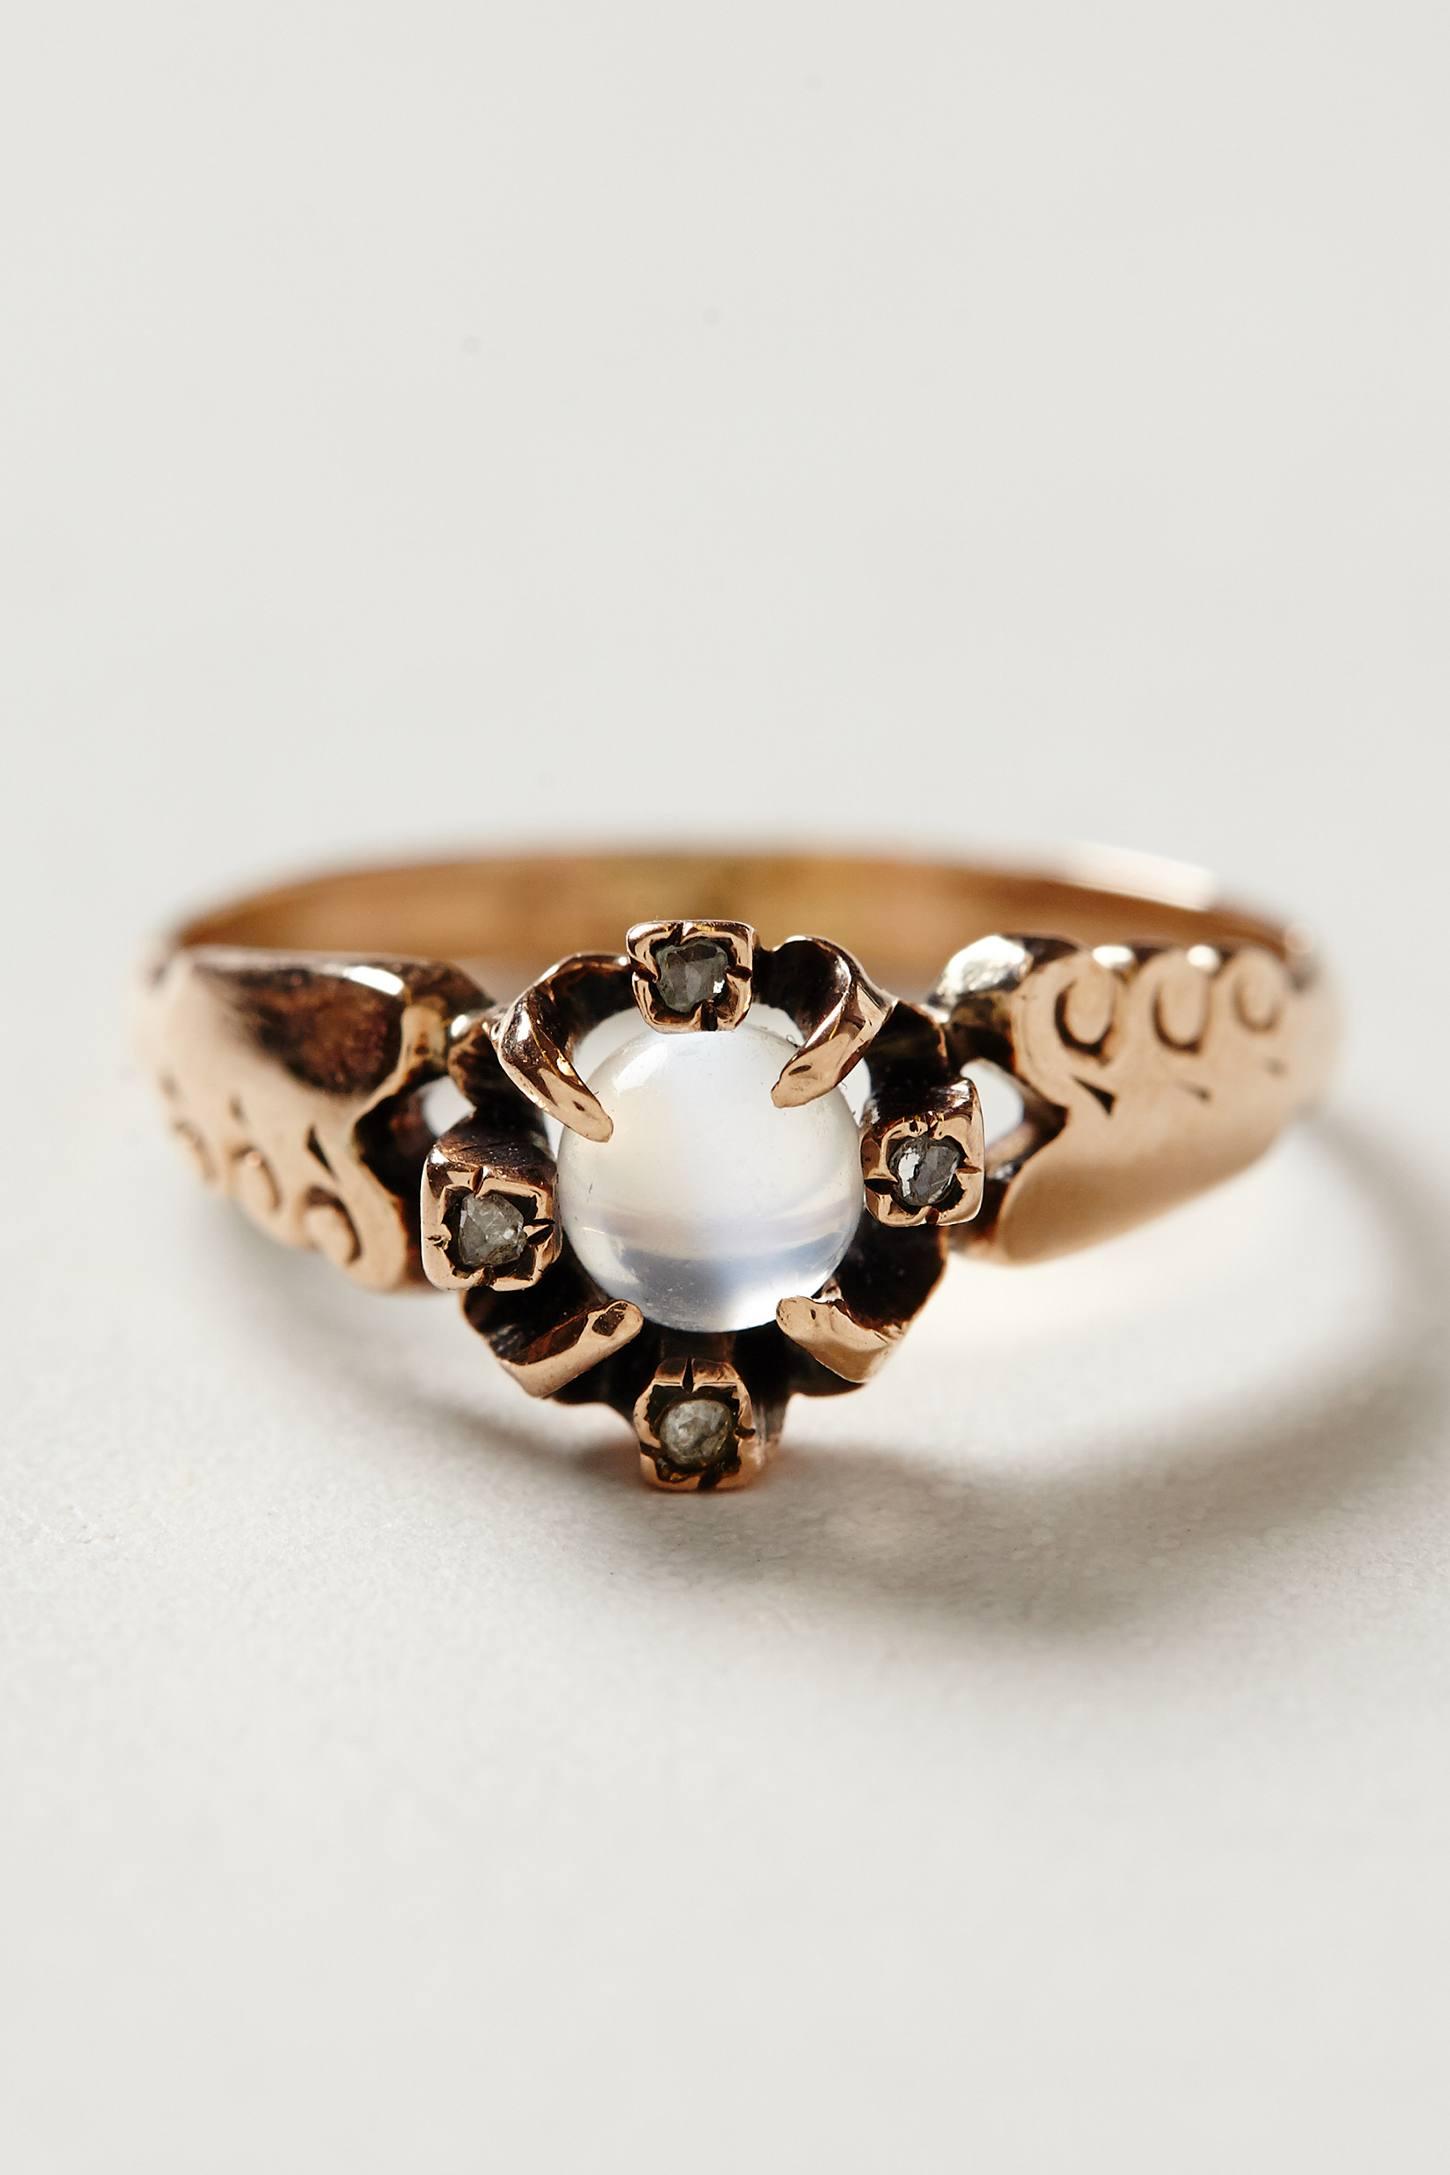 Vintage Moonstone Diamond Ring - anthropologie.com